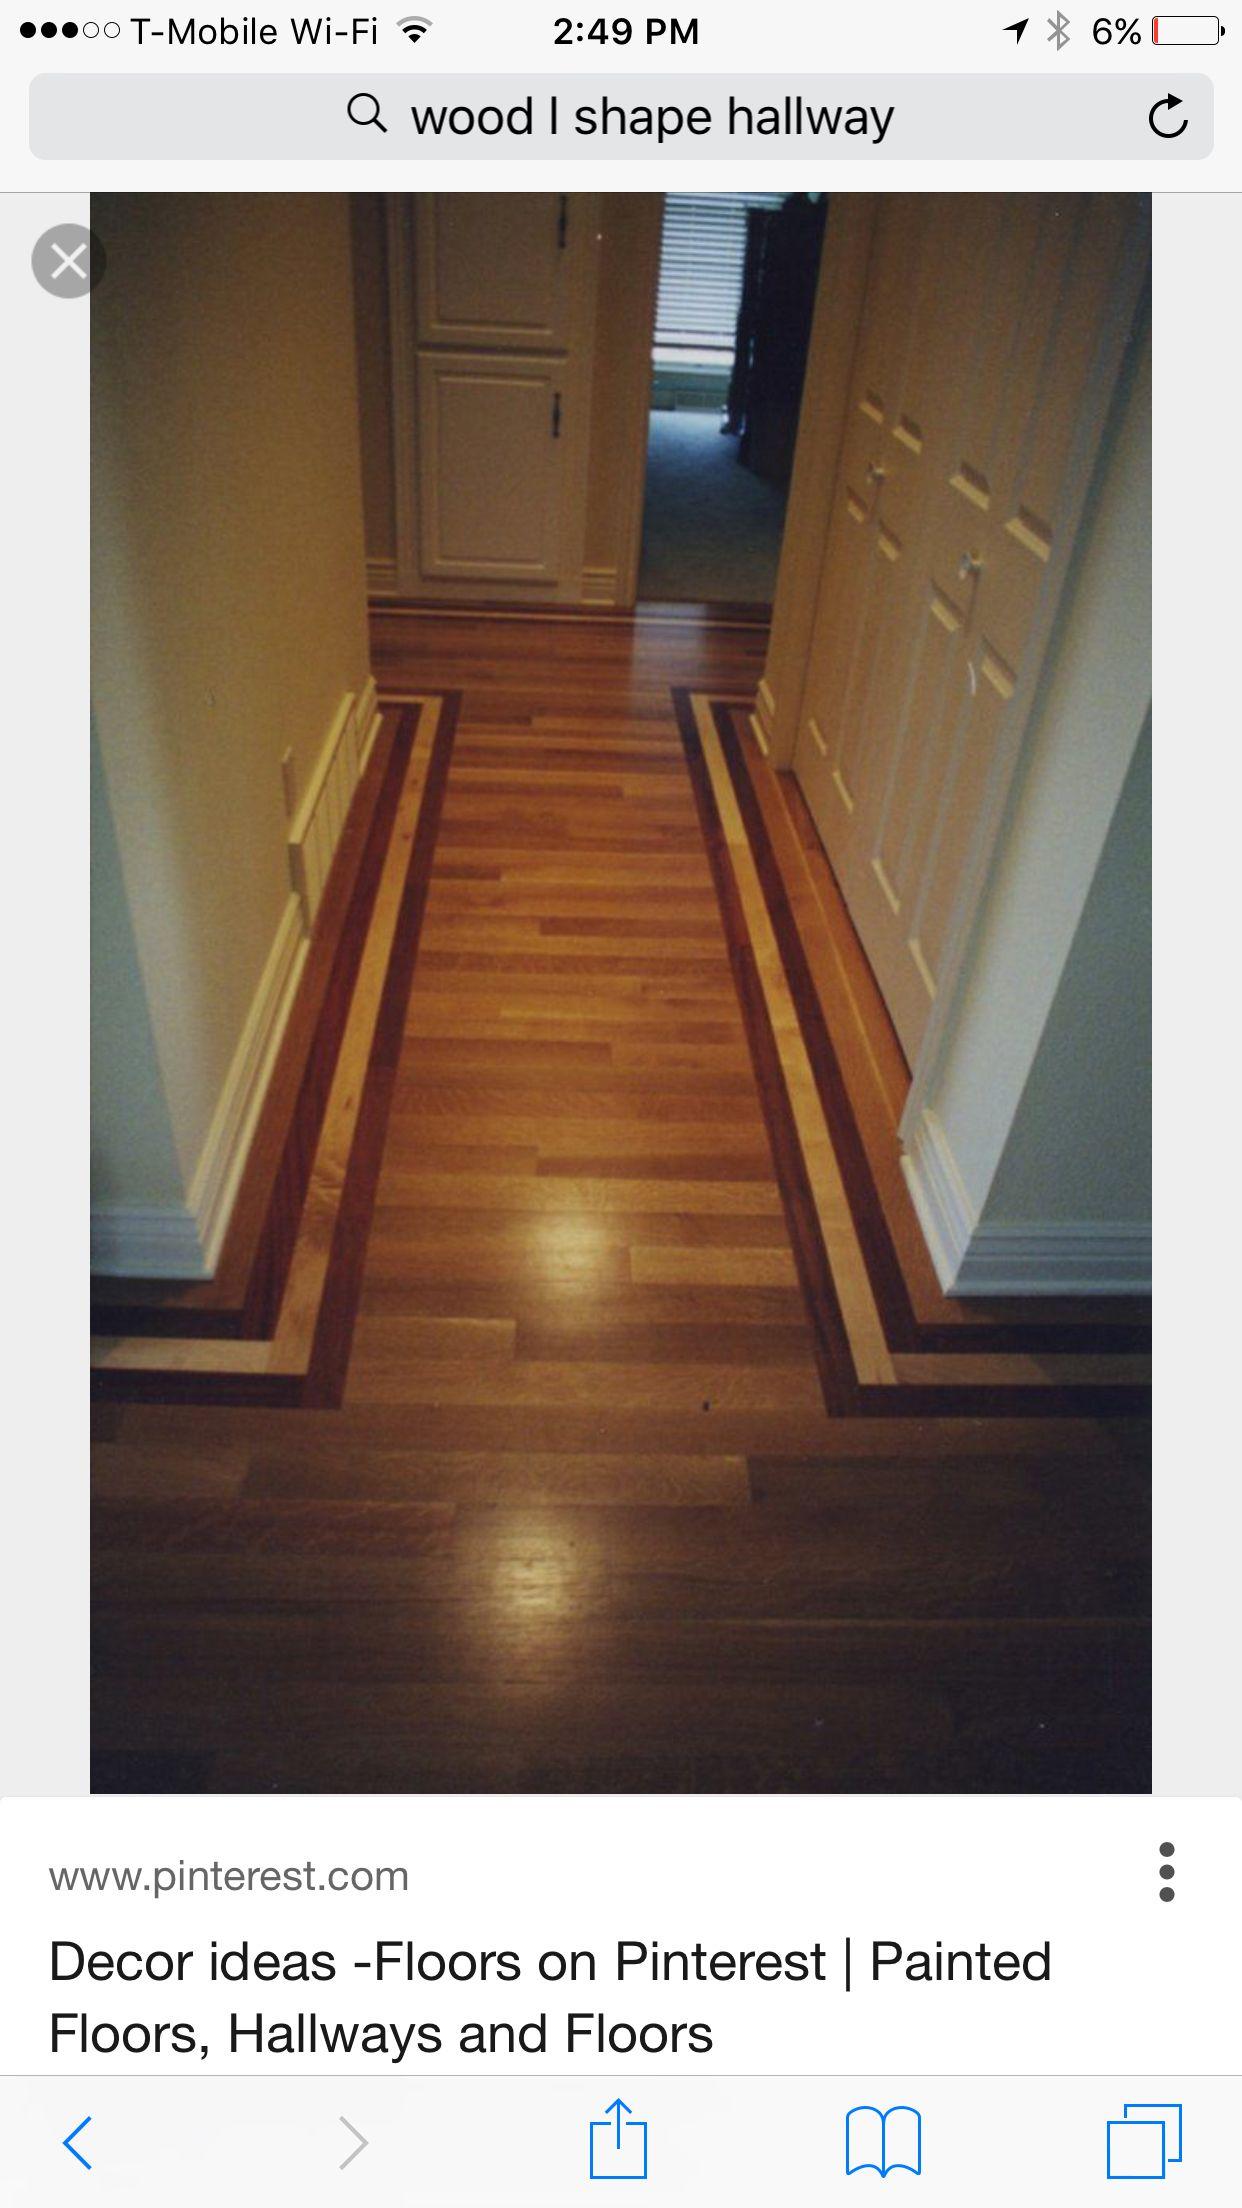 Pin by sunil sharma on sunilsharma design Flooring, Wood